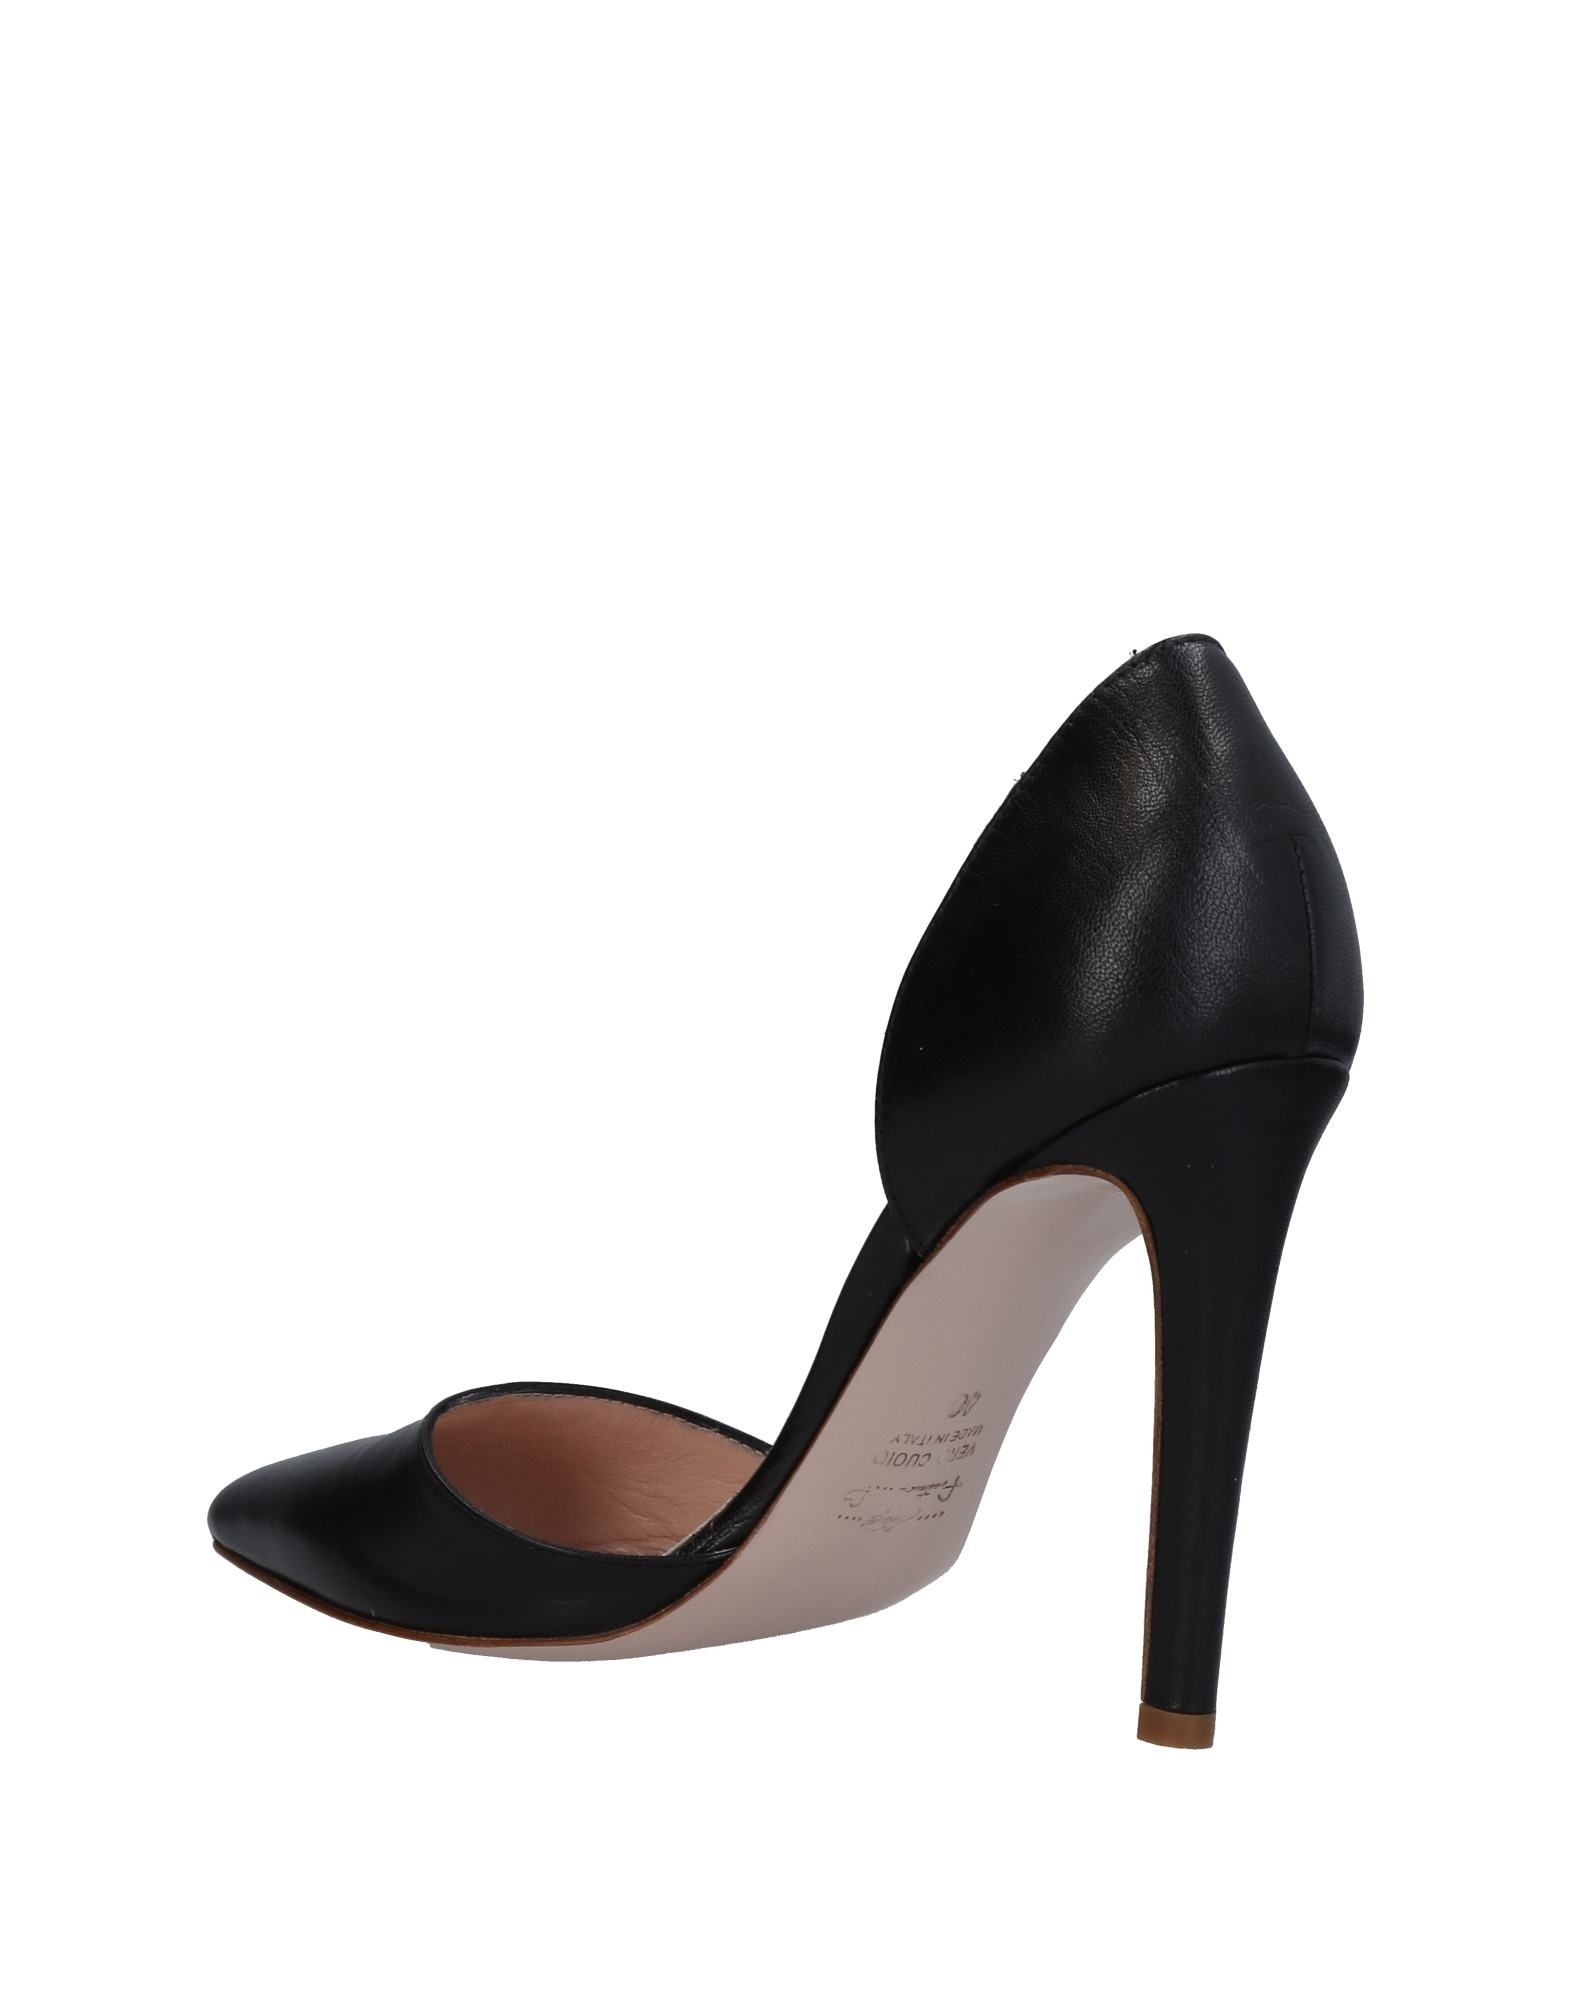 Piumi 11458059NJ Pumps Damen  11458059NJ Piumi Gute Qualität beliebte Schuhe c26470